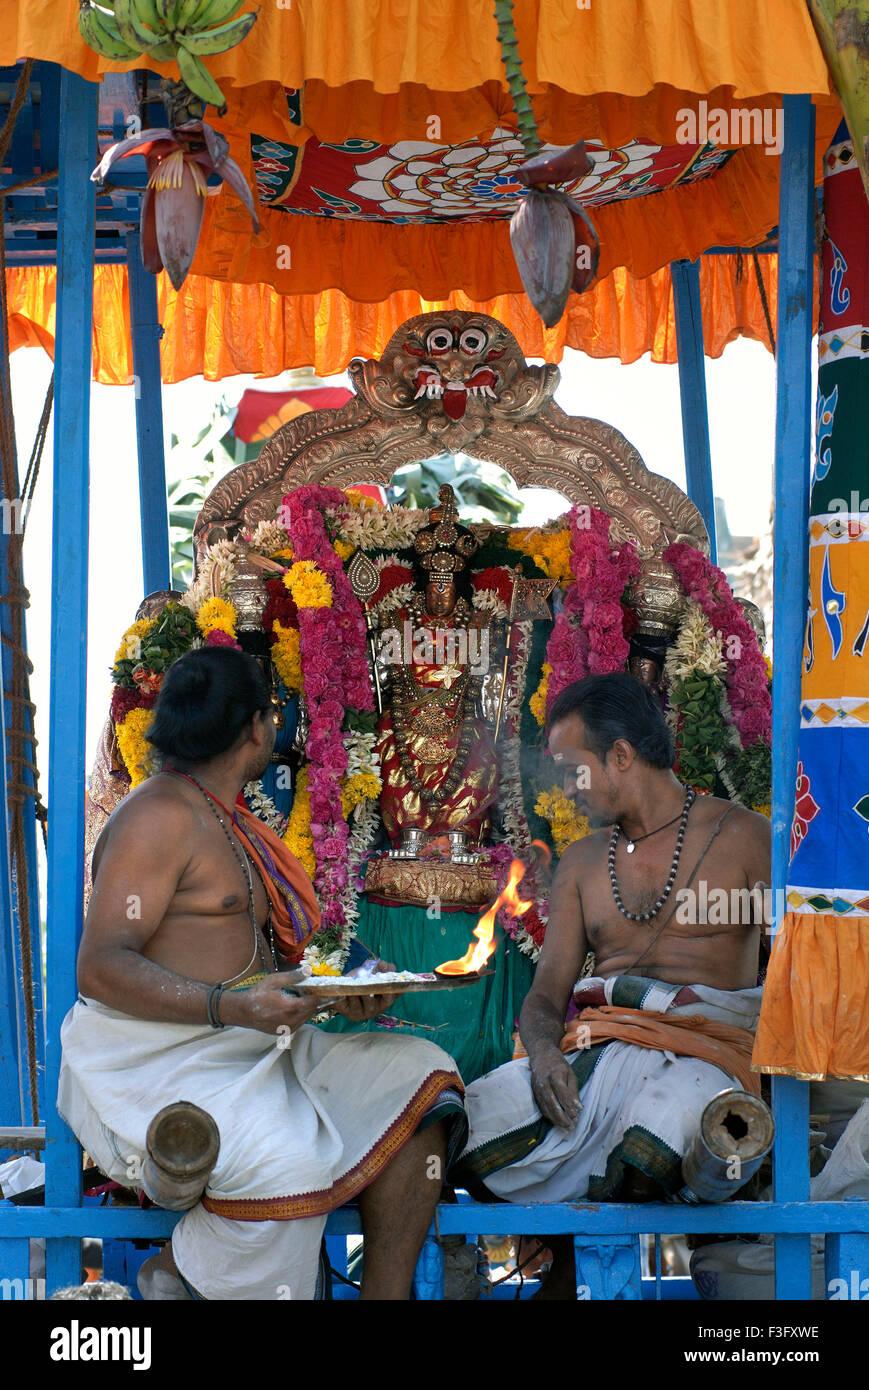 Urchava deity Lord Subrahmanya consort Valli Devasena Kapaleswara Shiva temple festival Mylapore Chennai Tamil Nadu - Stock Image